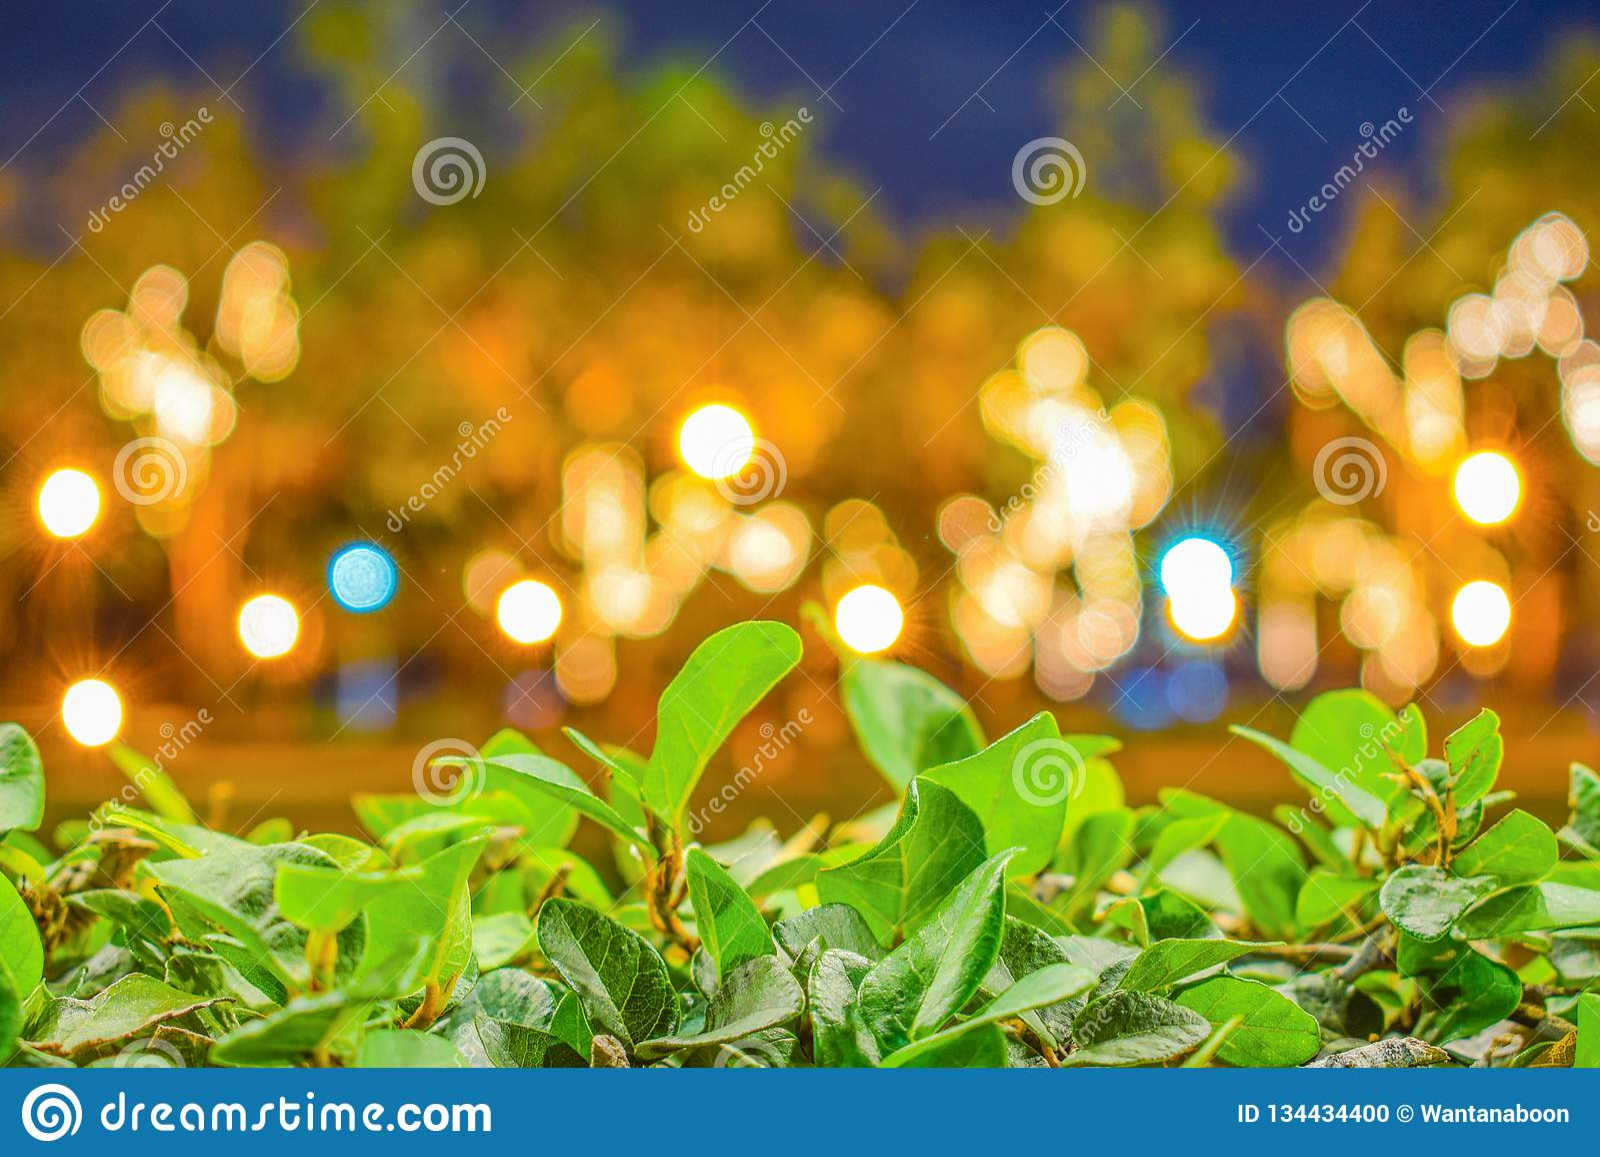 Folhas verdes na frente do fundo borrado de Bokeh